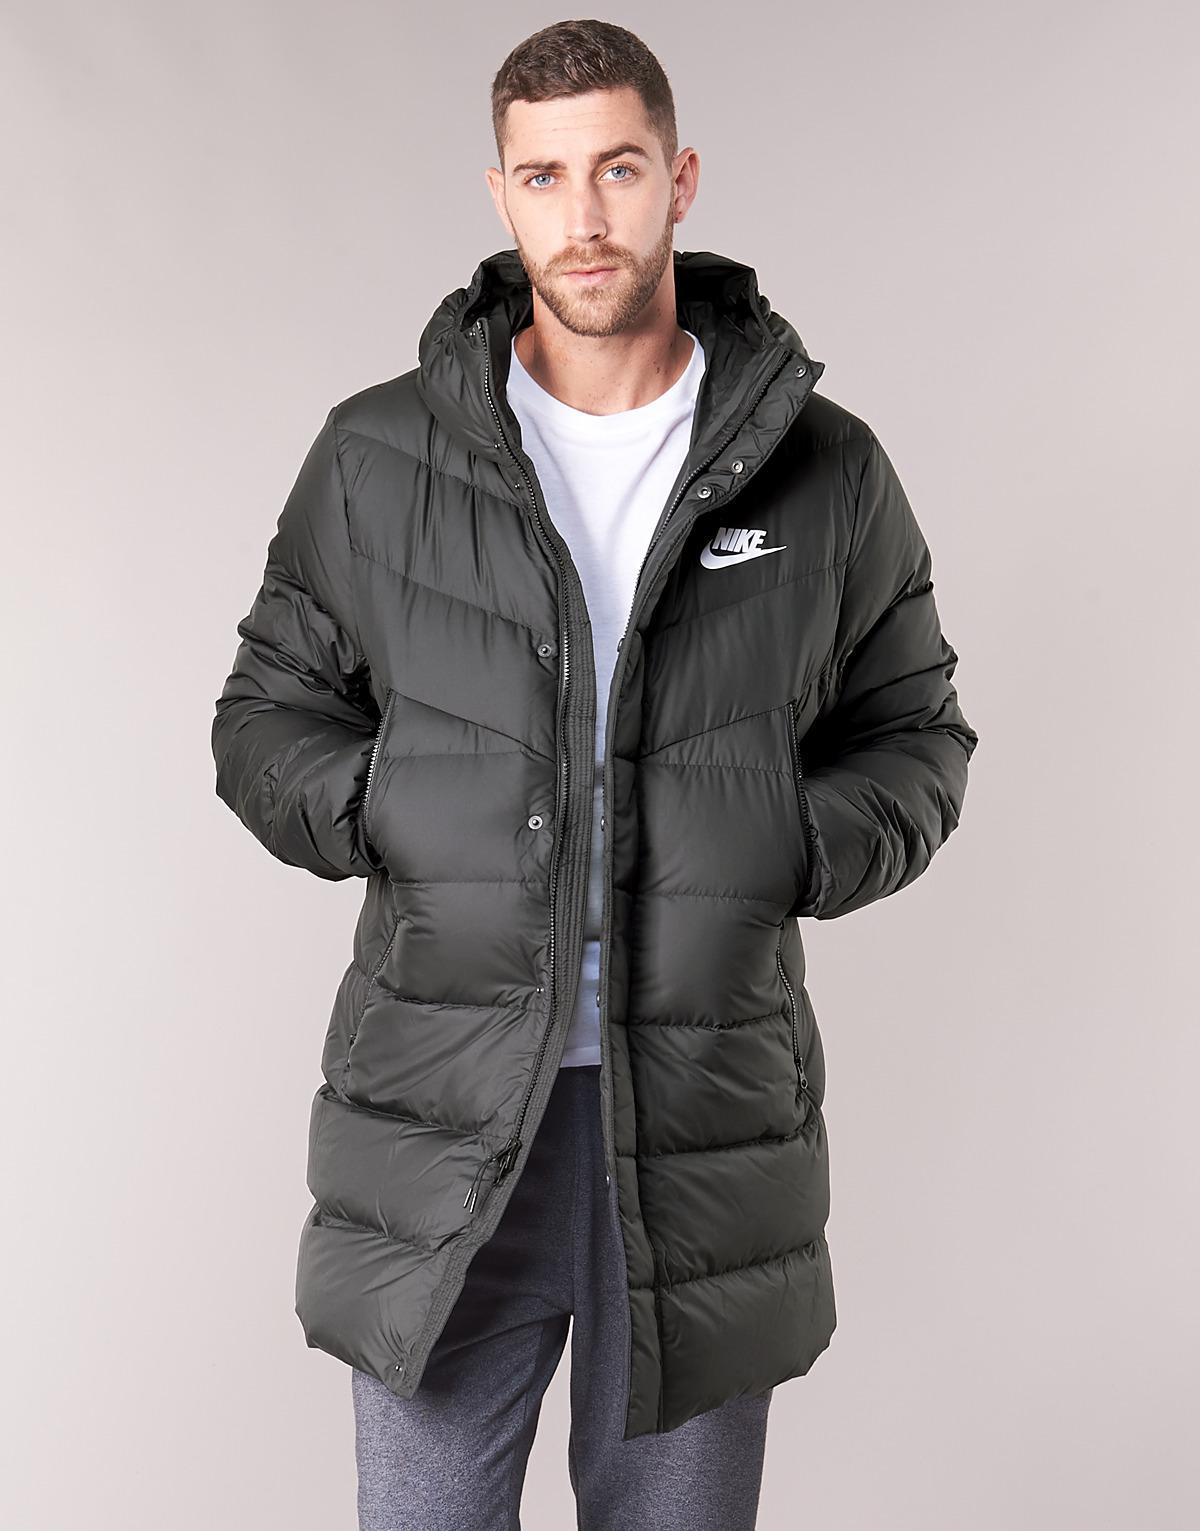 321cf63833e7 Nike Brenla Jacket in Black for Men - Save 24% - Lyst